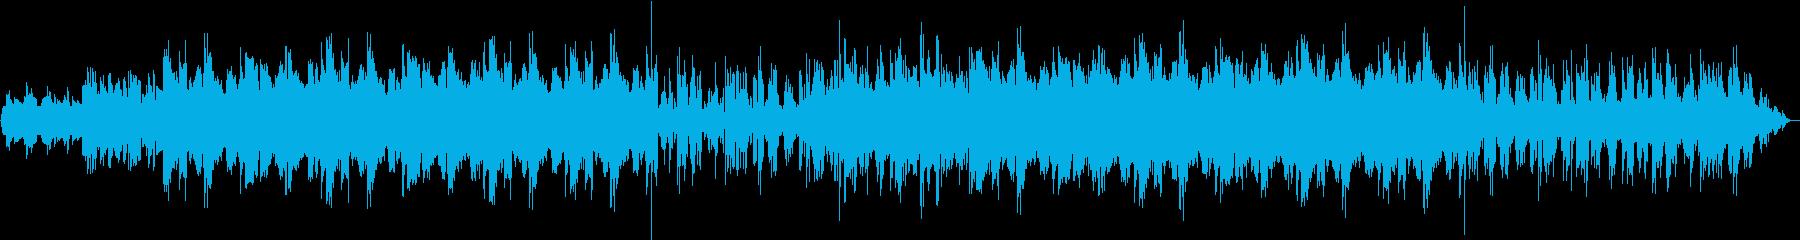 120bpm、F#-min、エレピ曲の再生済みの波形